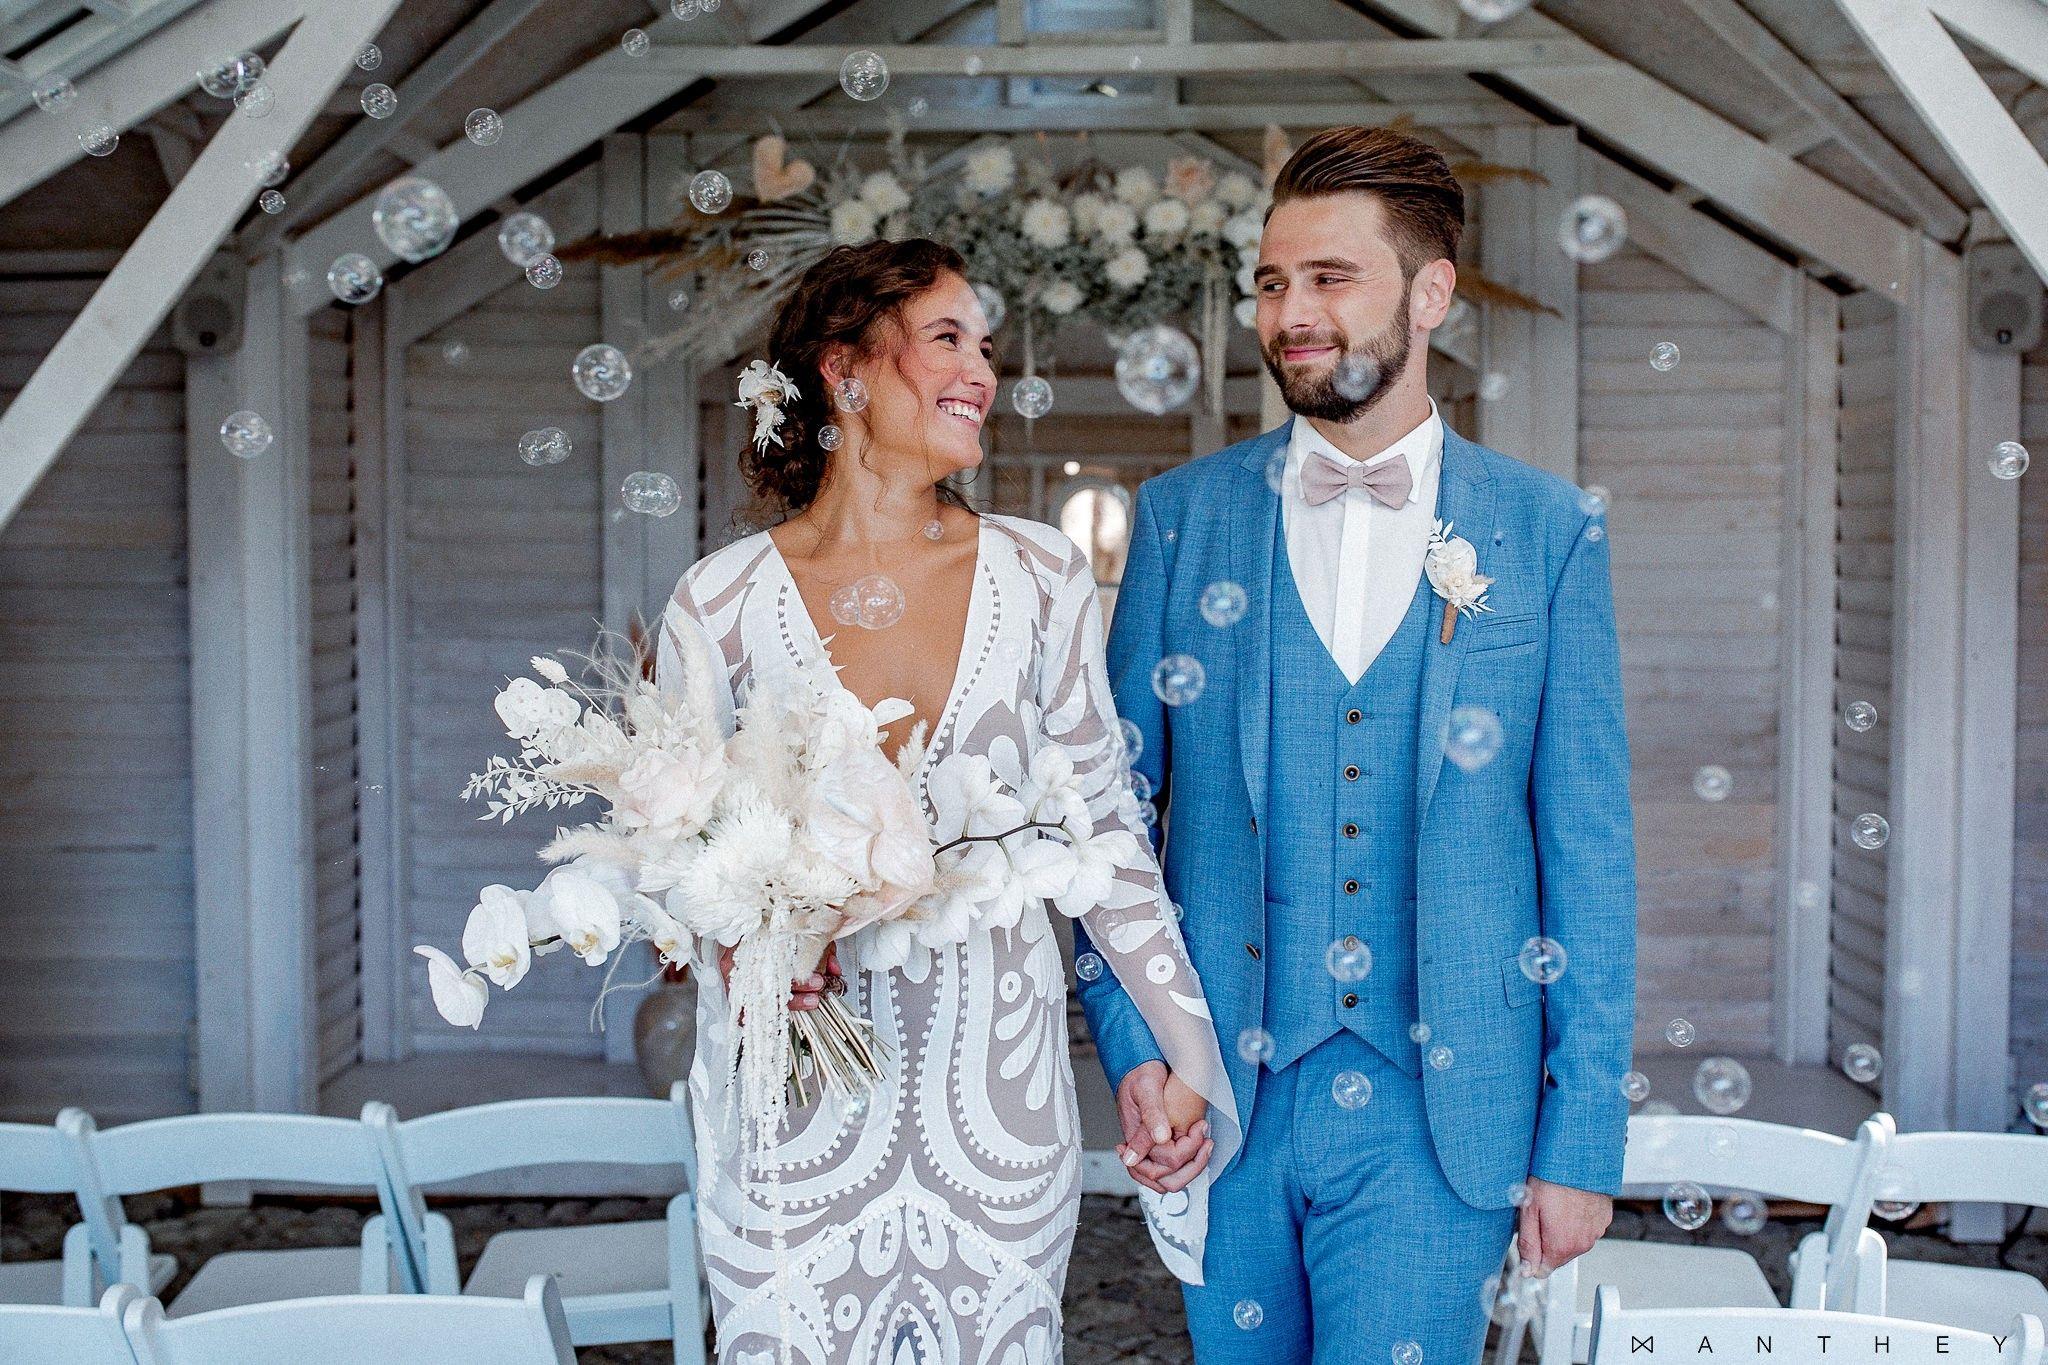 Christian Manthey Fotografie Oberhafenkantine Hochzeitsfotograf Berlin Hochzeit Berlin Hochzeitsfotograf